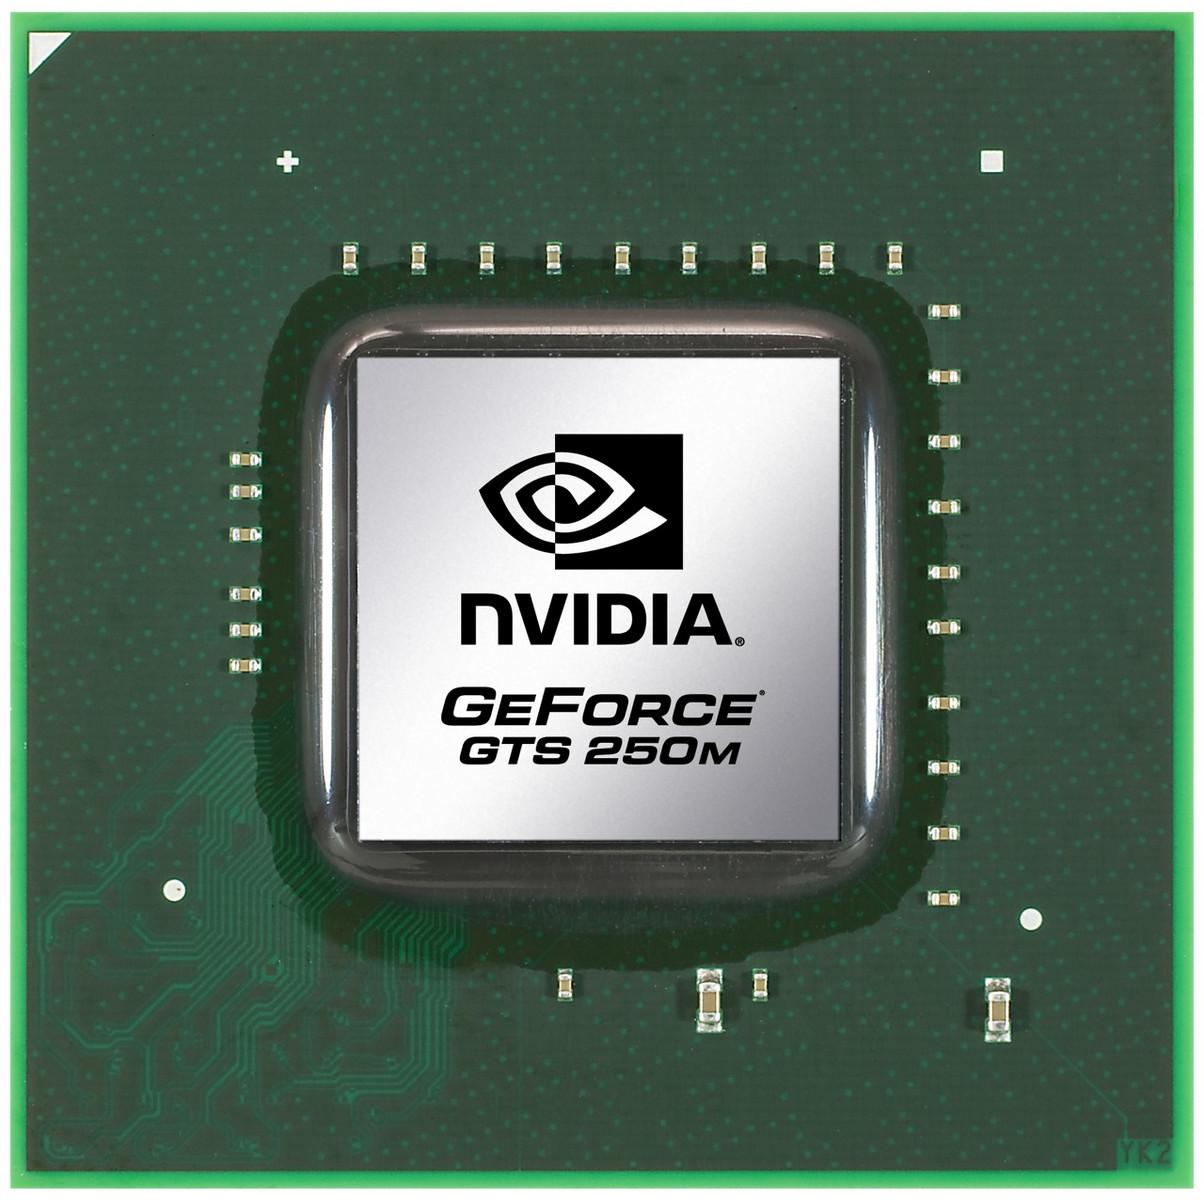 Geforce g105m 512mb driver cuda nvidia